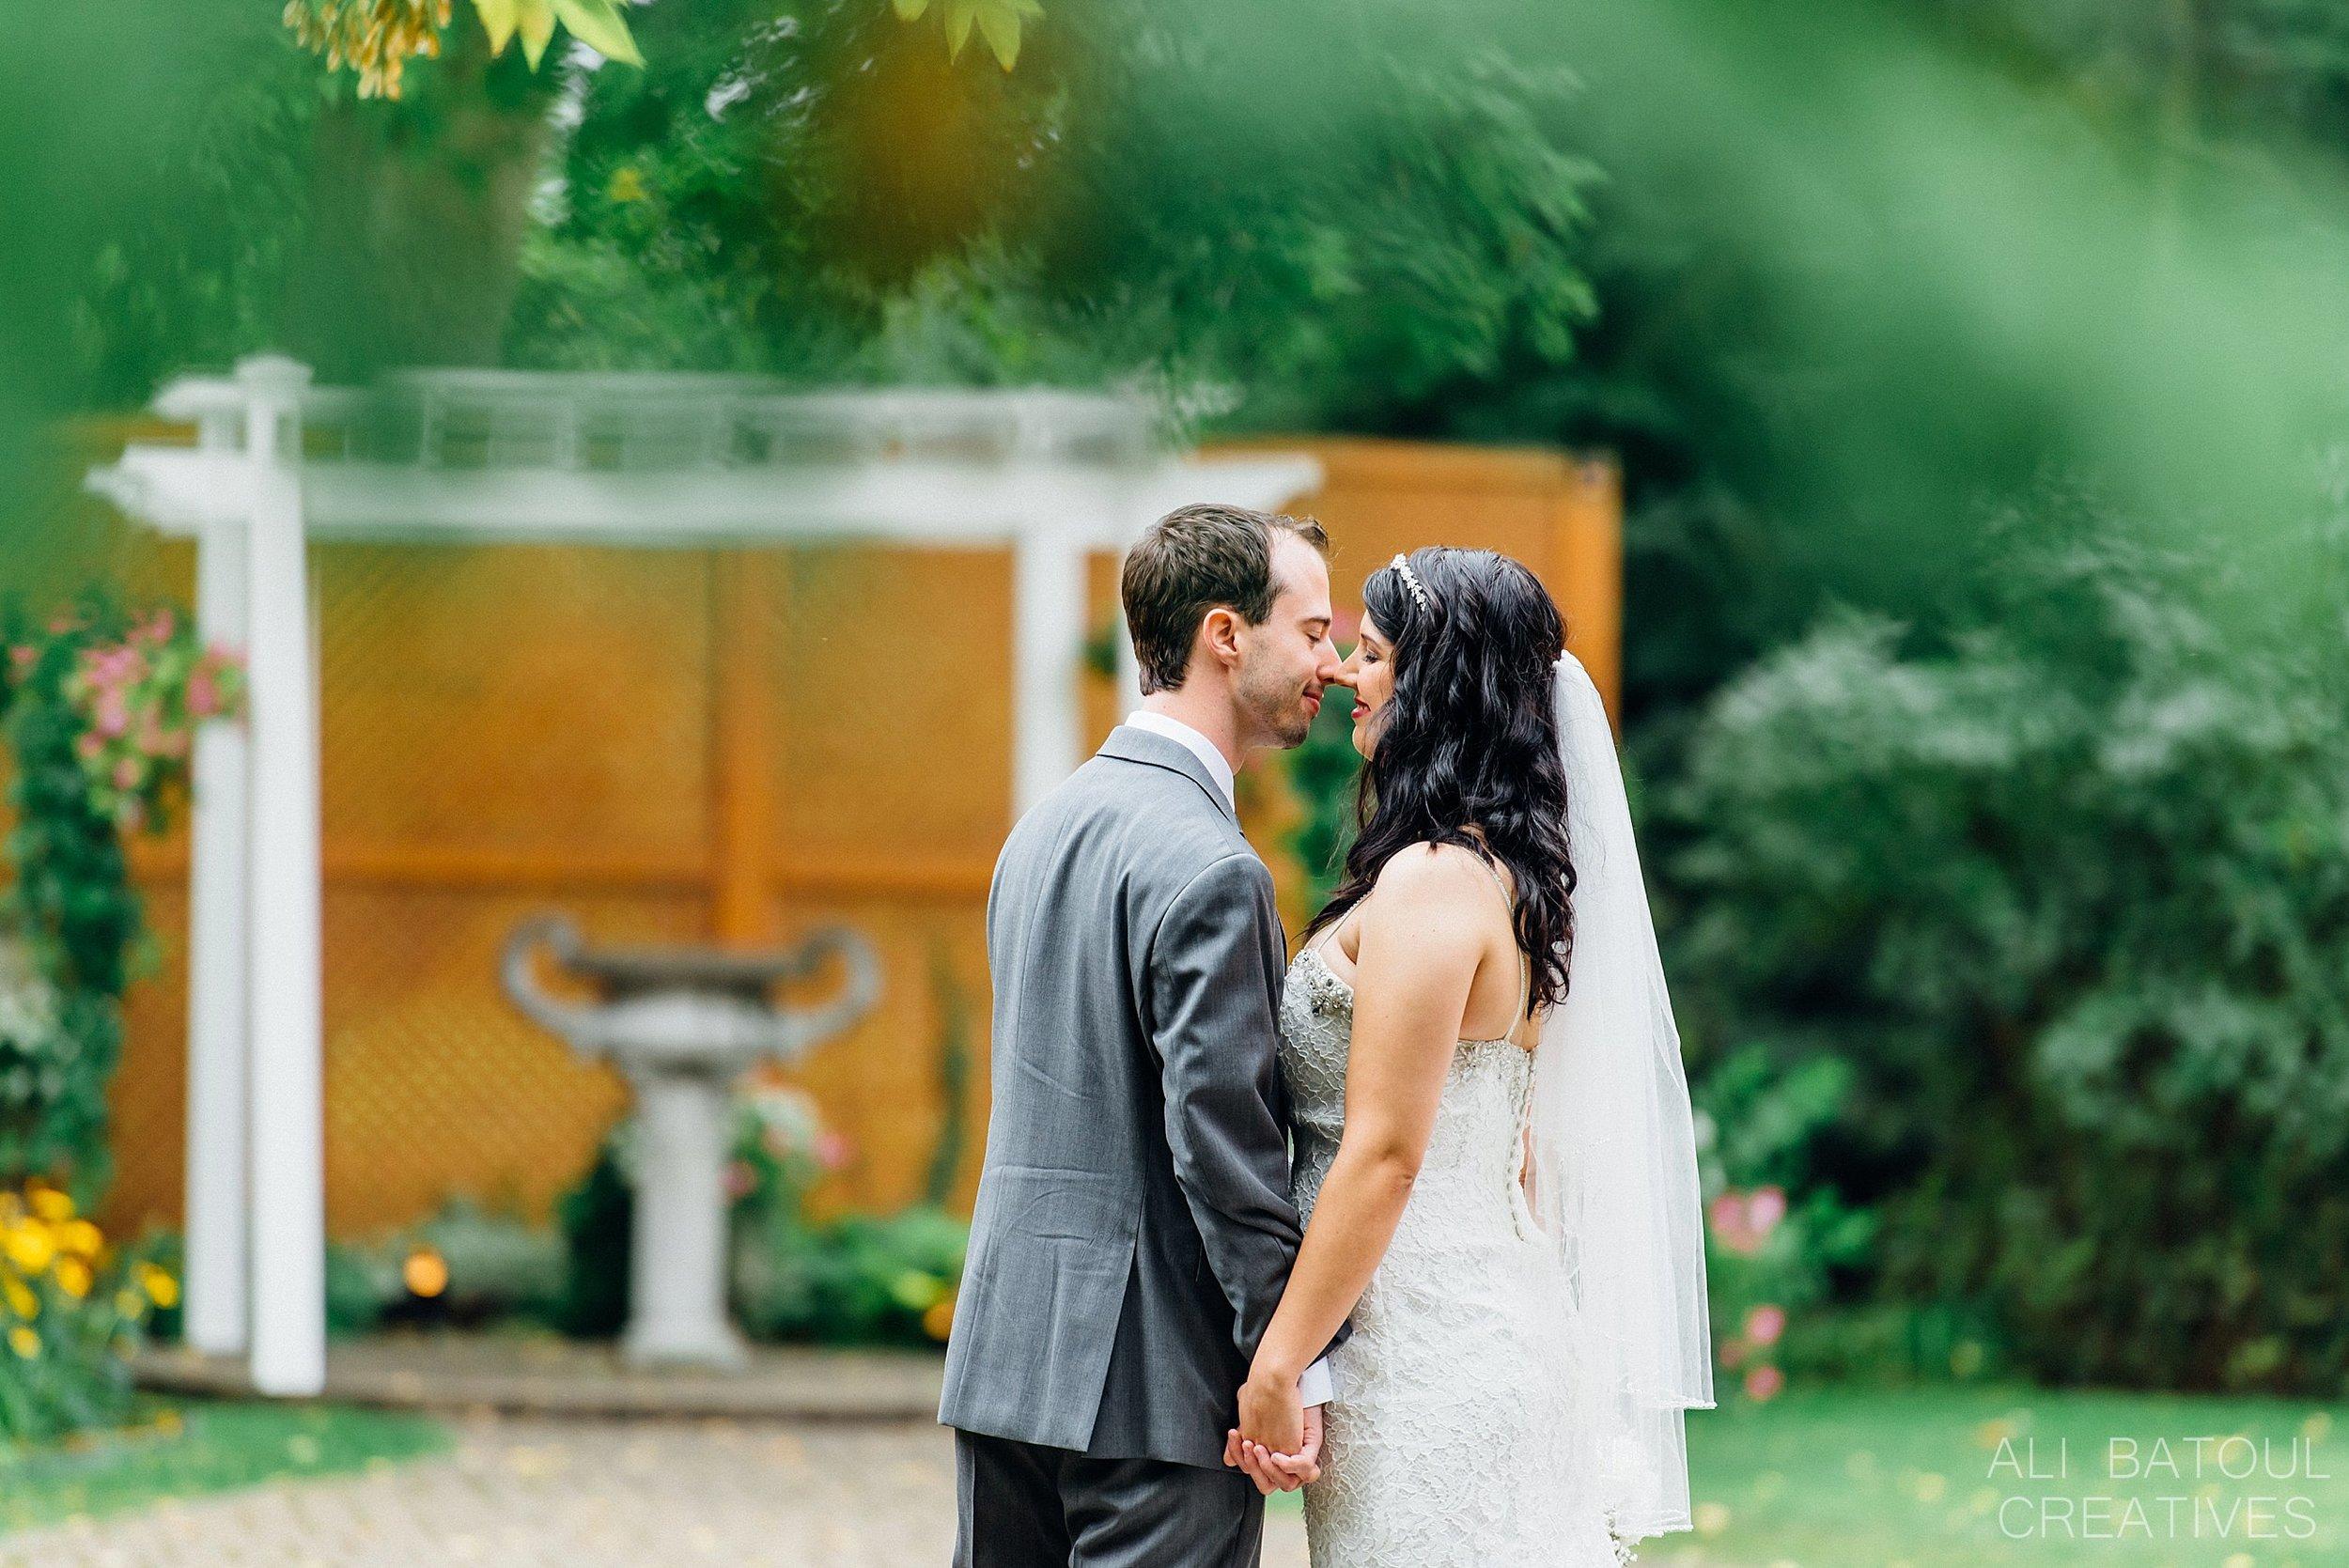 Jocelyn + Steve At The Schoolhouse Wedding - Ali and Batoul Fine Art Wedding Photography_0037.jpg